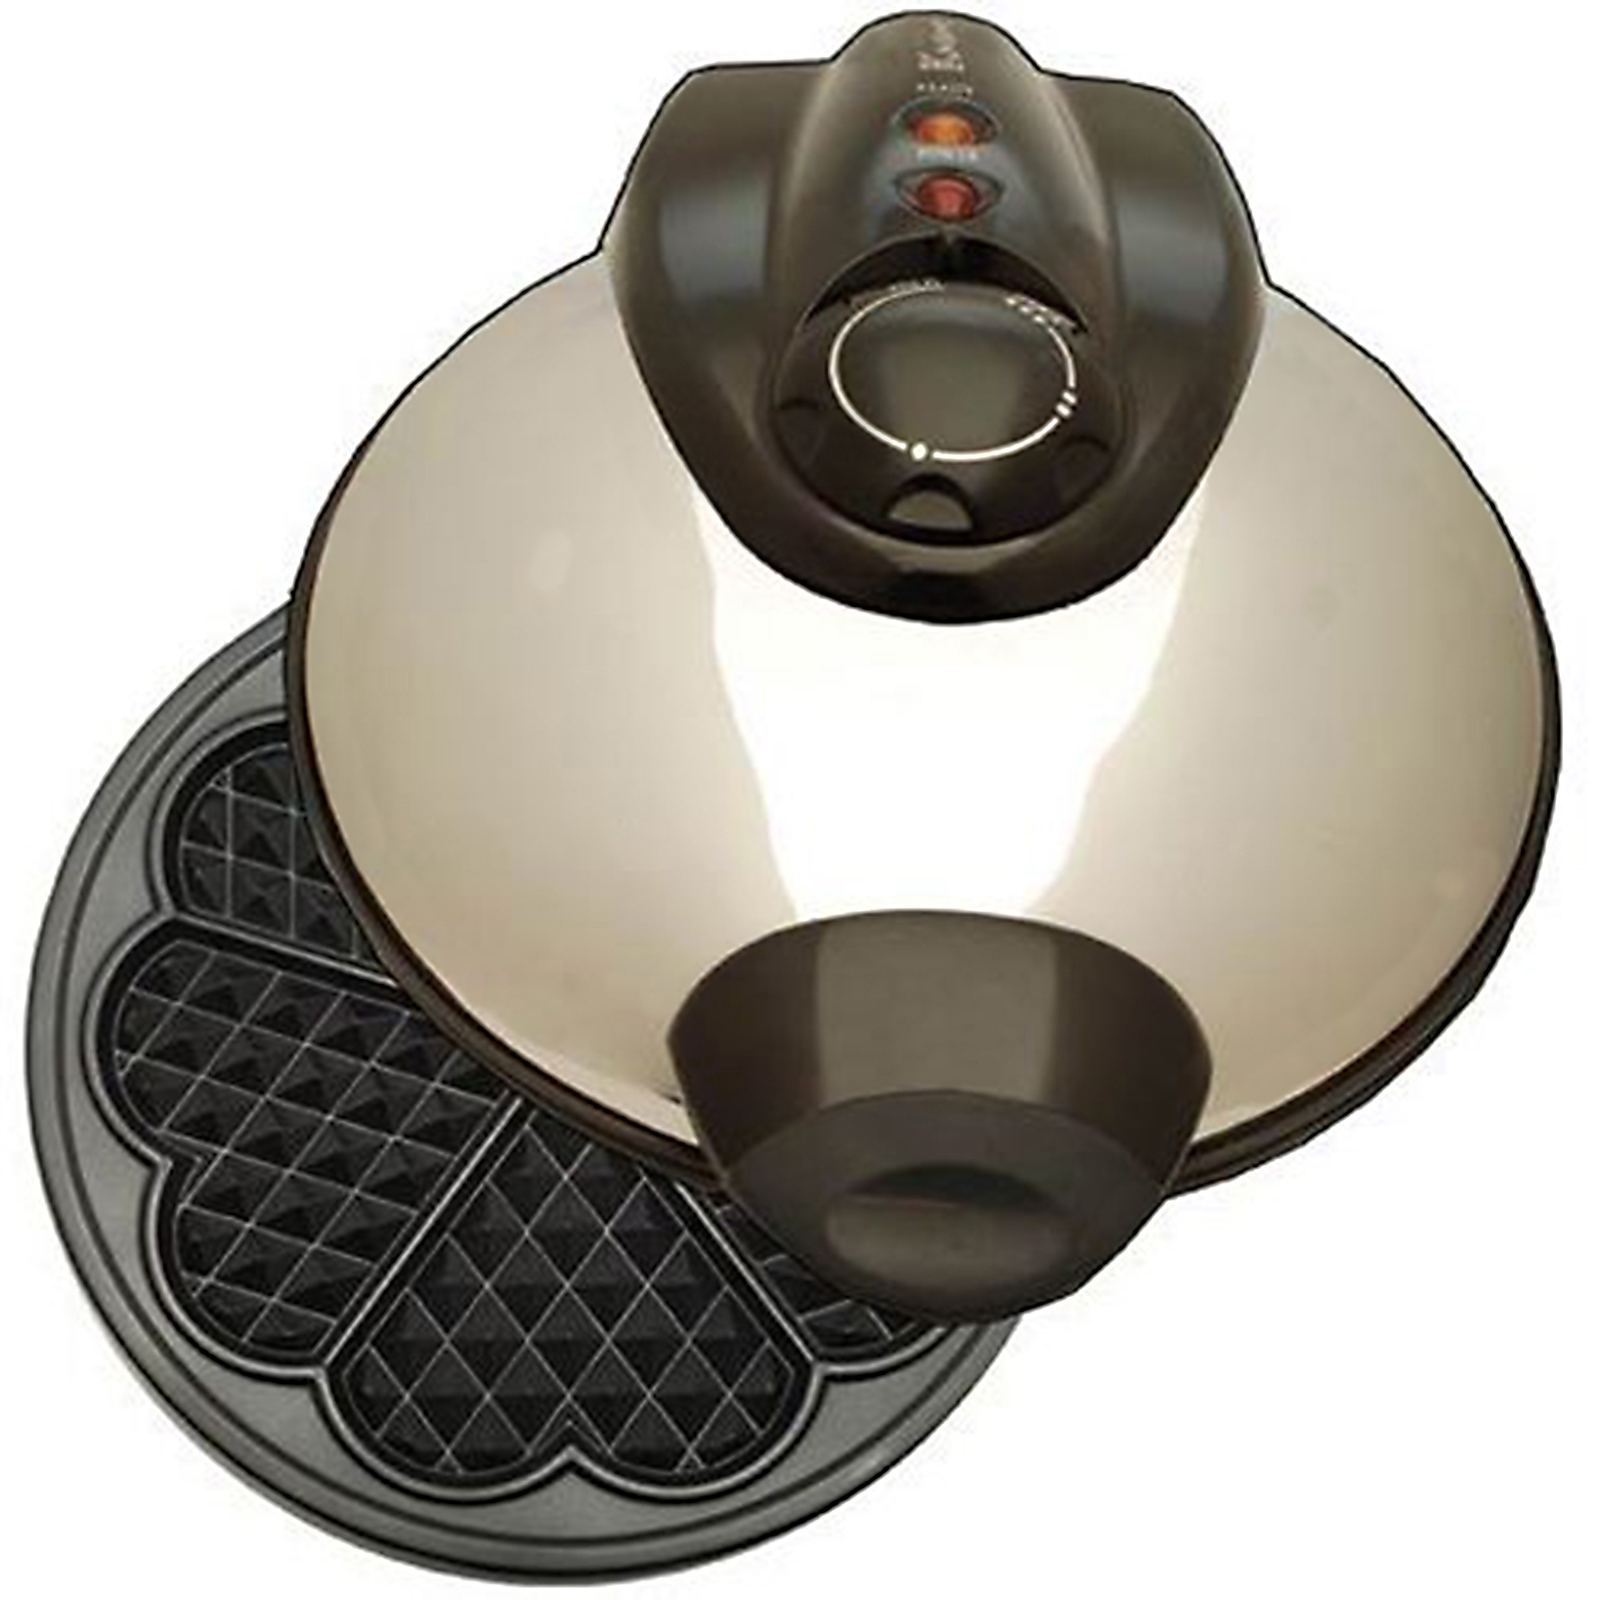 Euro-Cuisine 8 Heart Design Waffle Maker - WM420